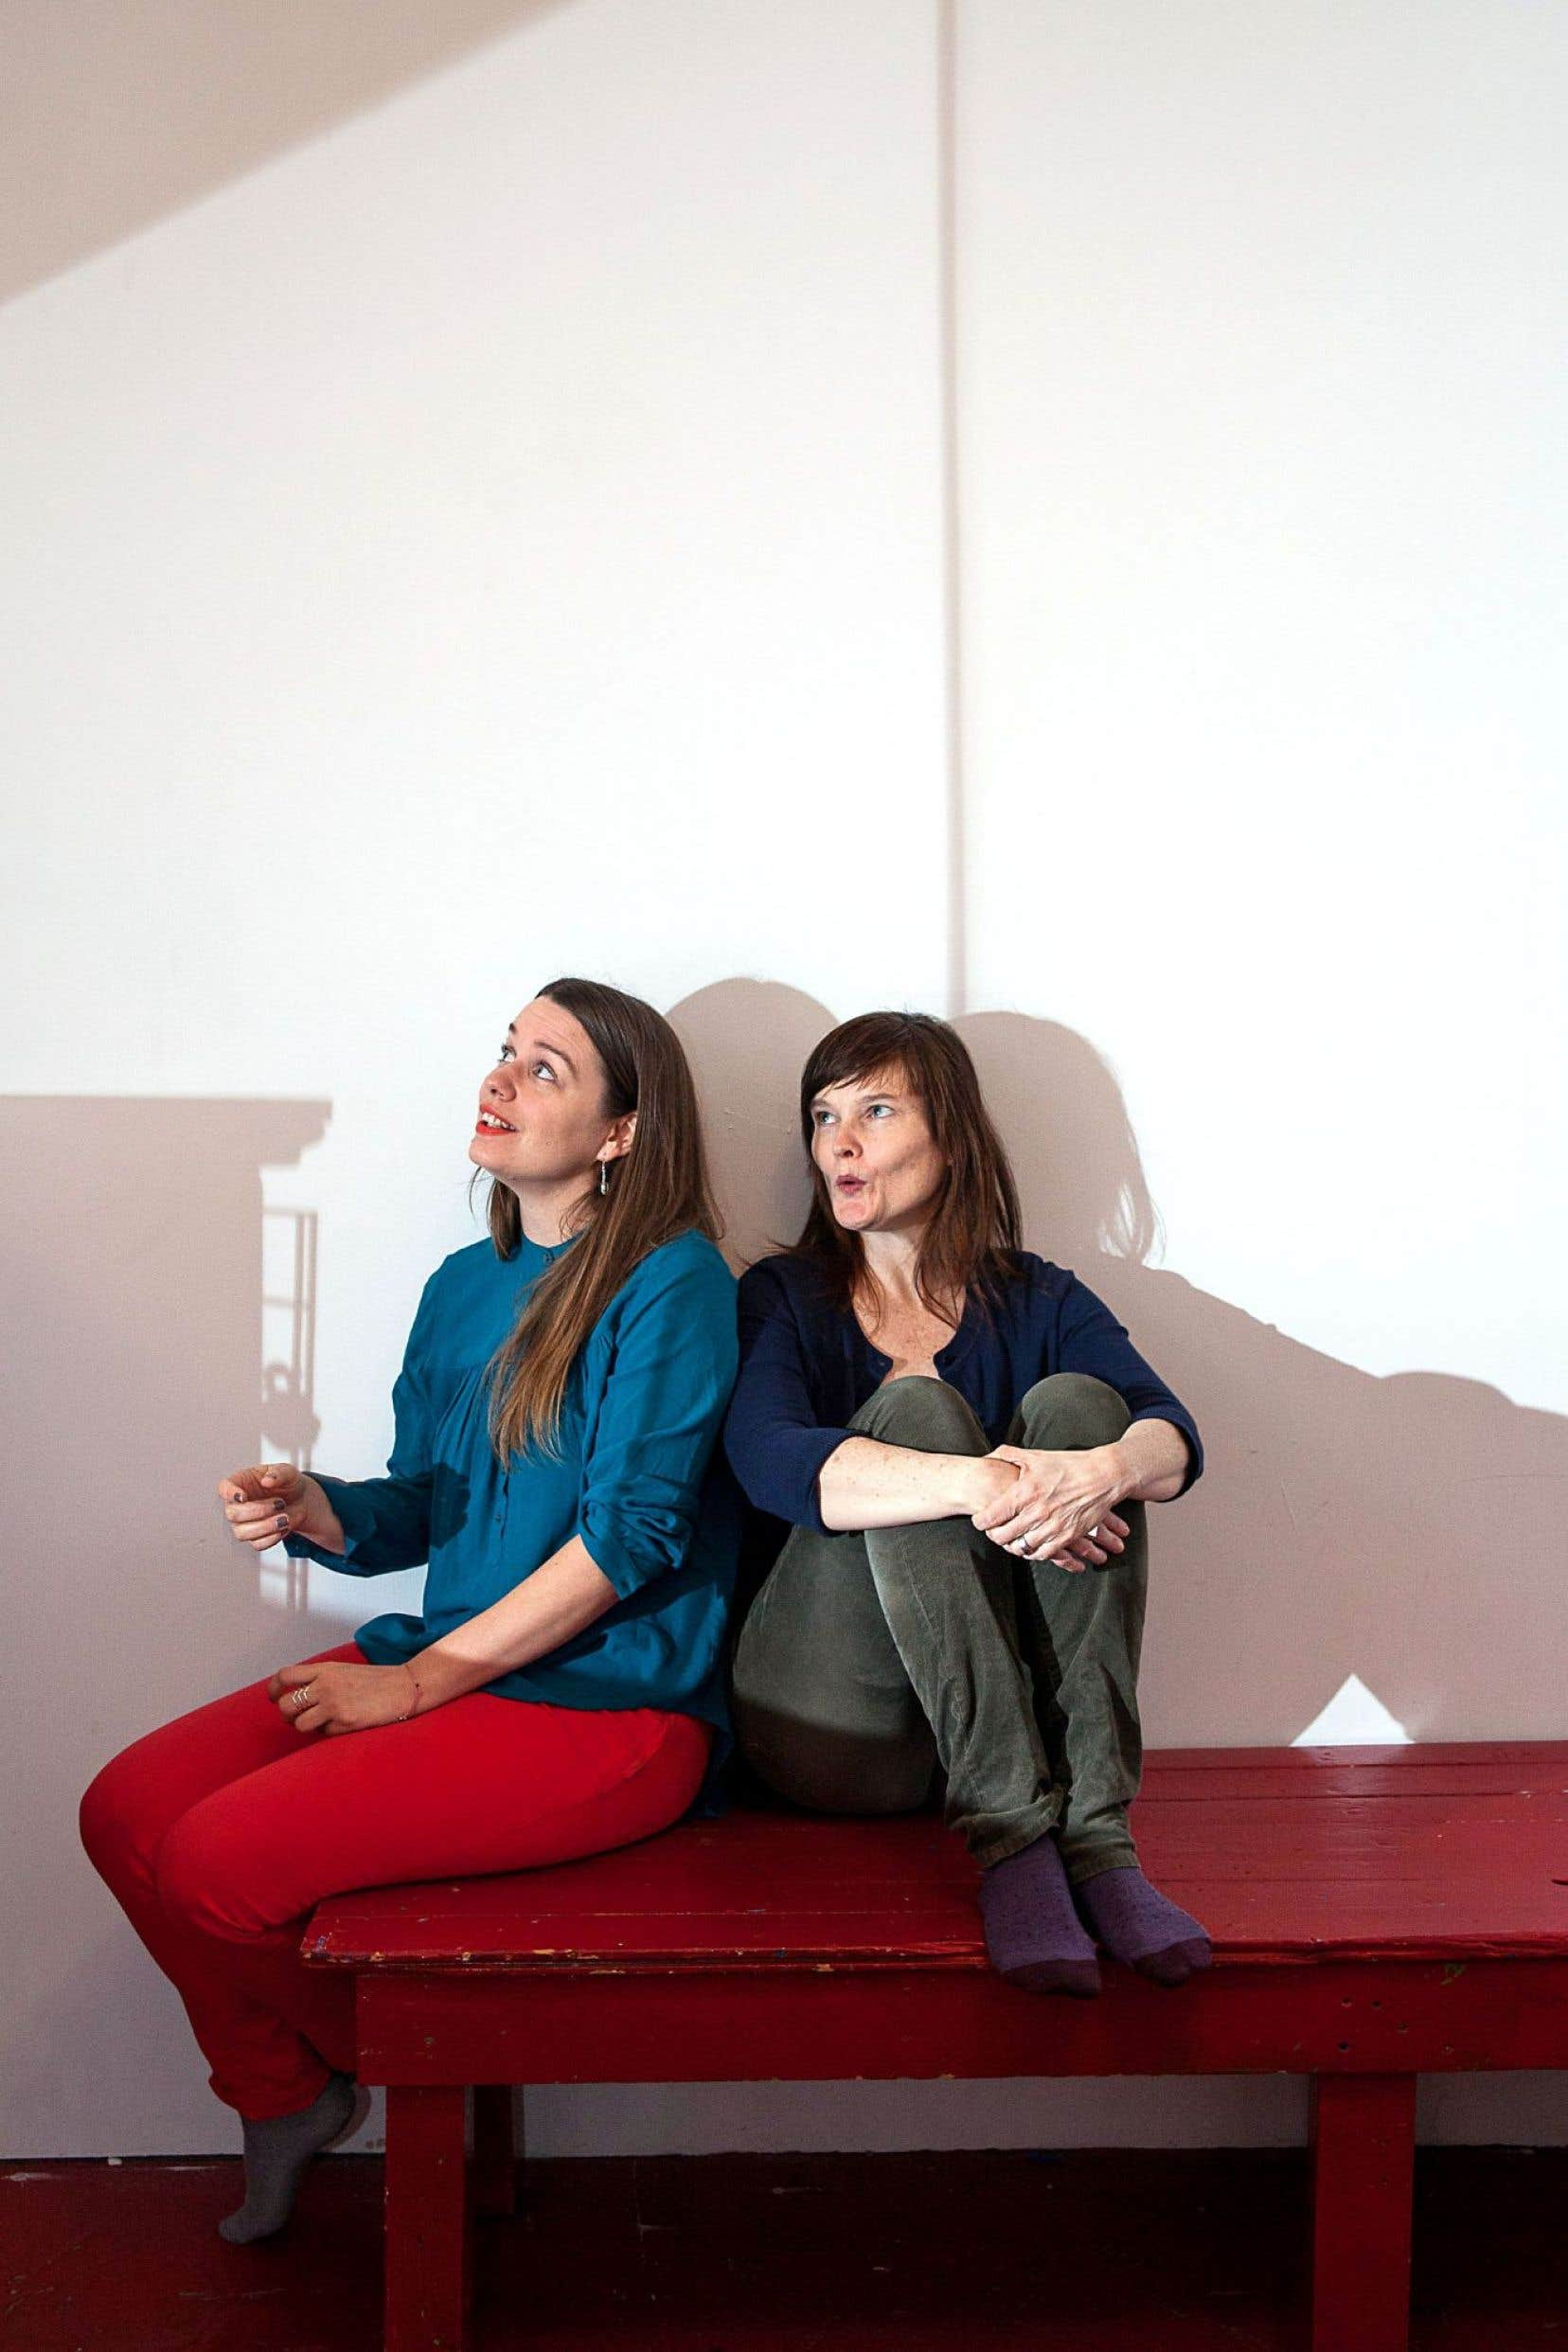 Andrea Rideout et Miriam Ginestier, têtes dirigeantes du festival Edgy Women